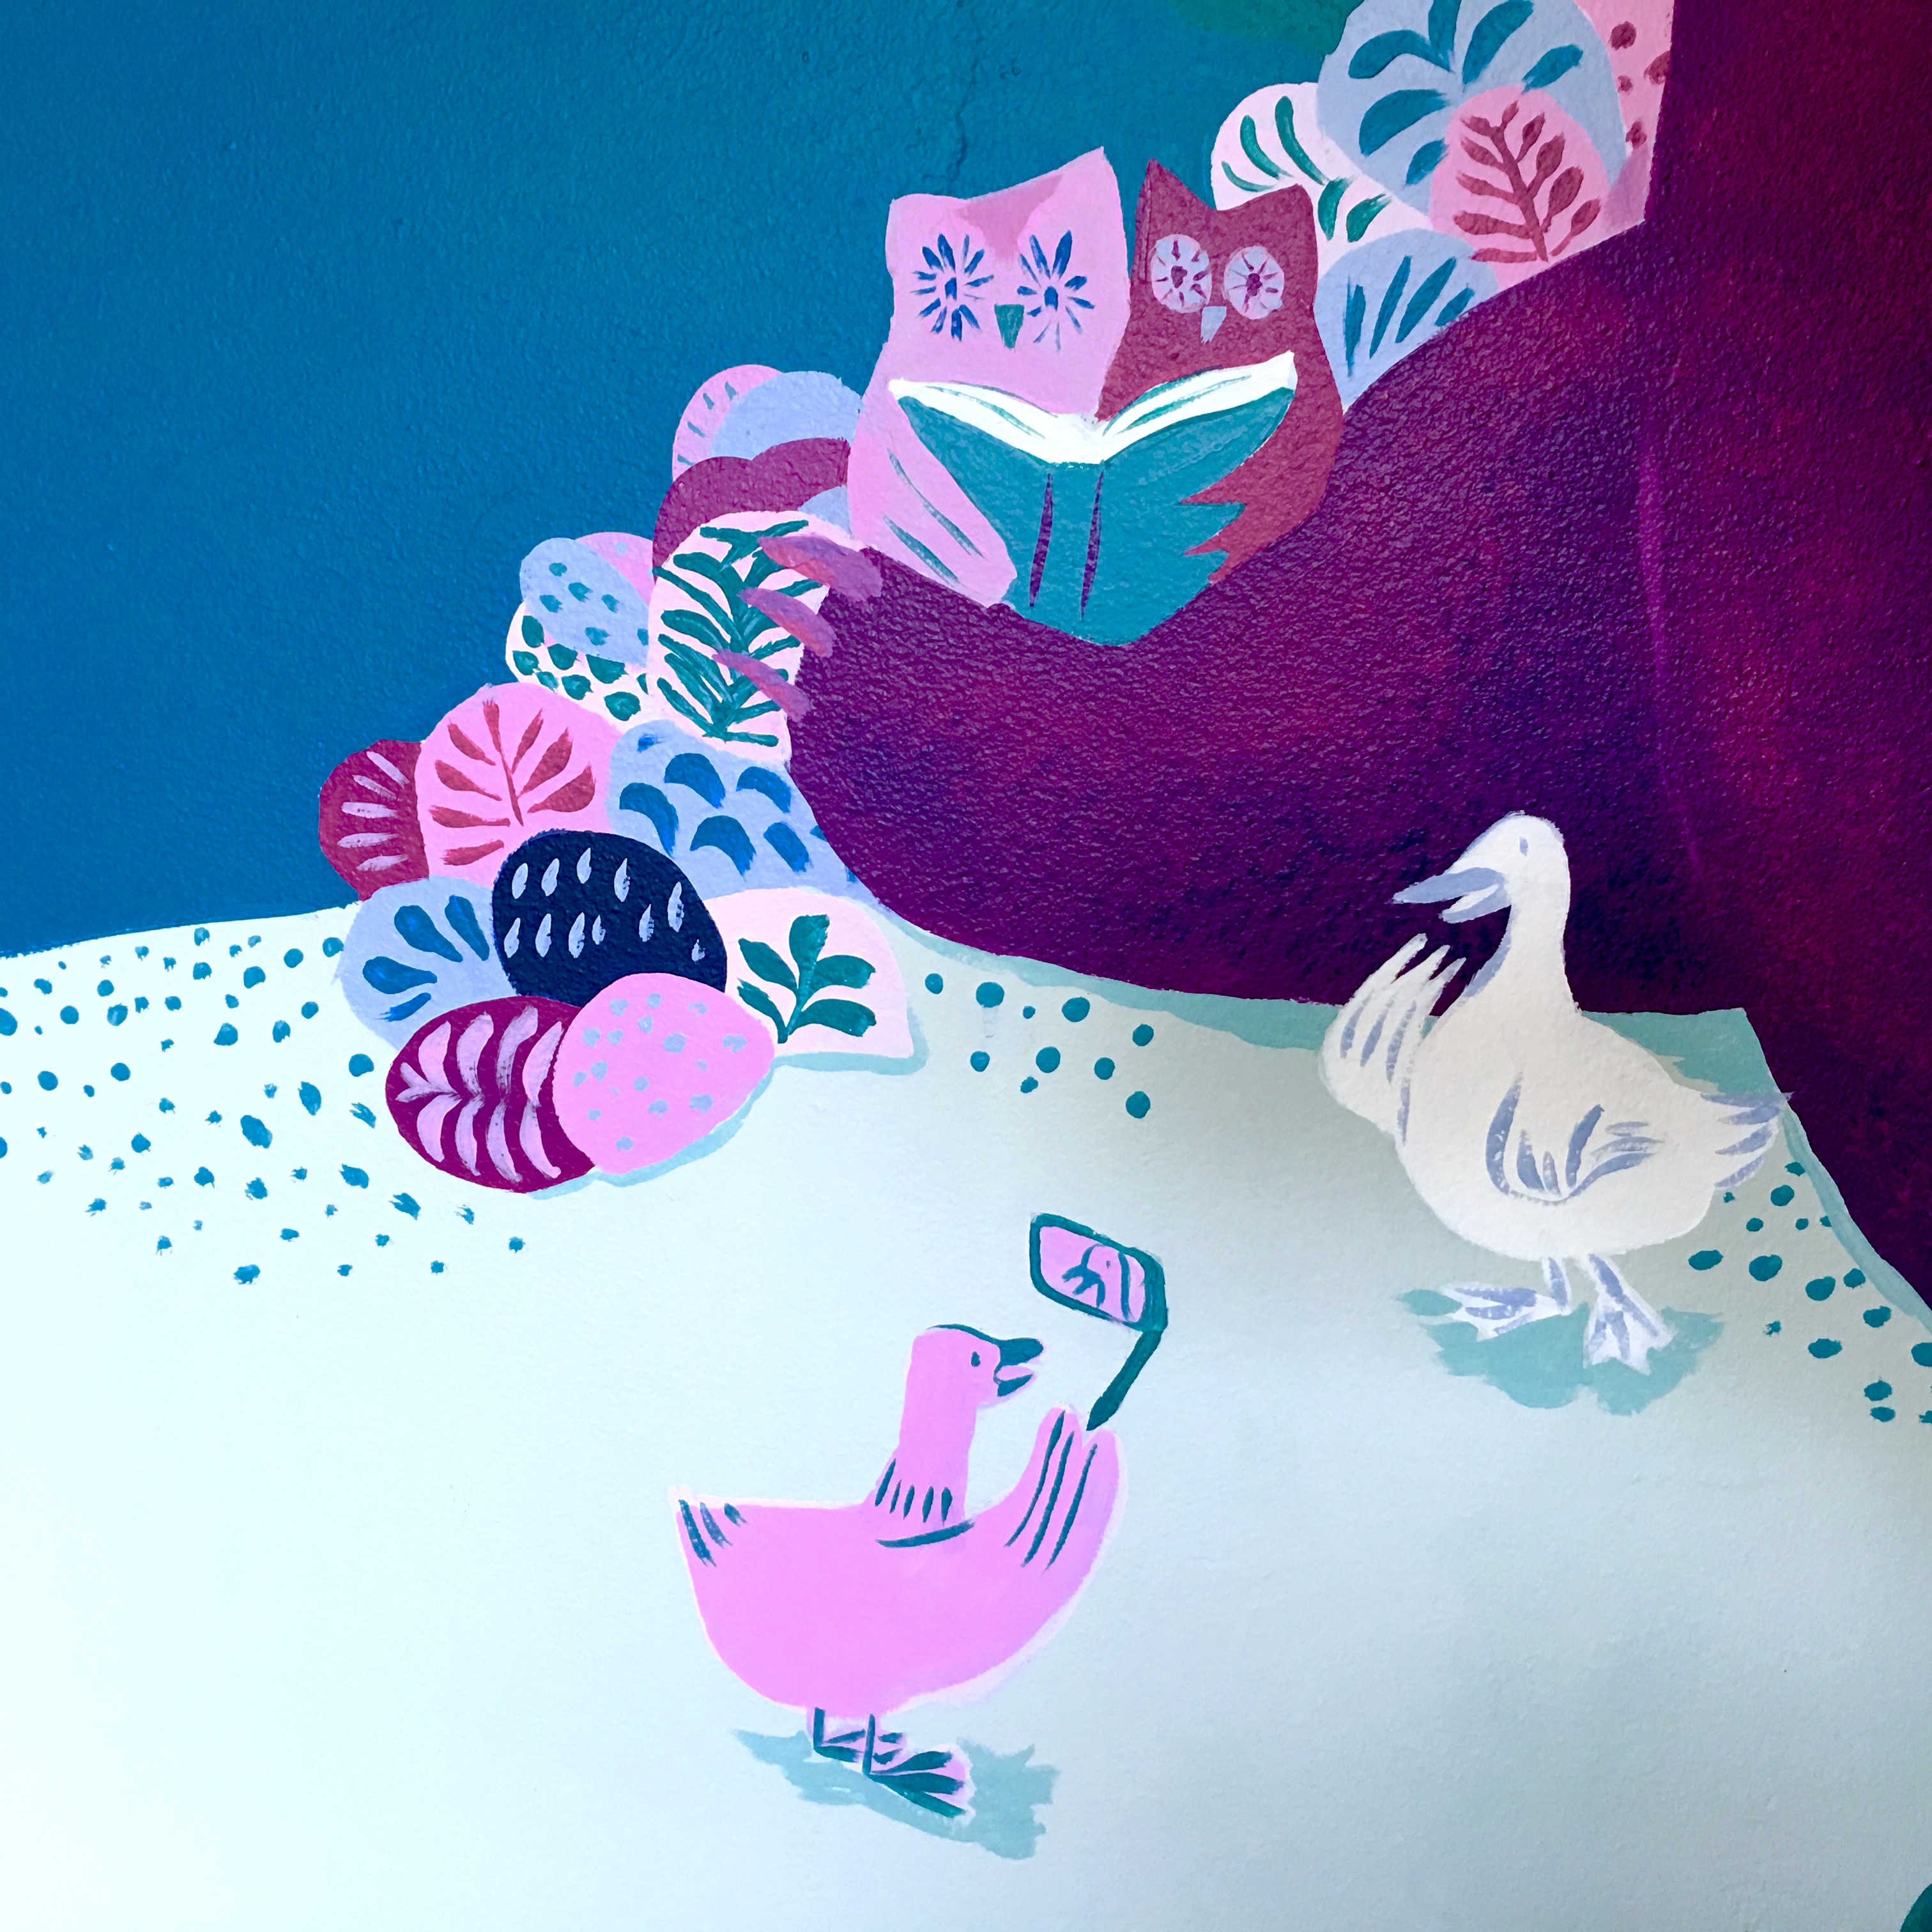 mural detail: owl's reading a bedtime story & ducks taking selfies